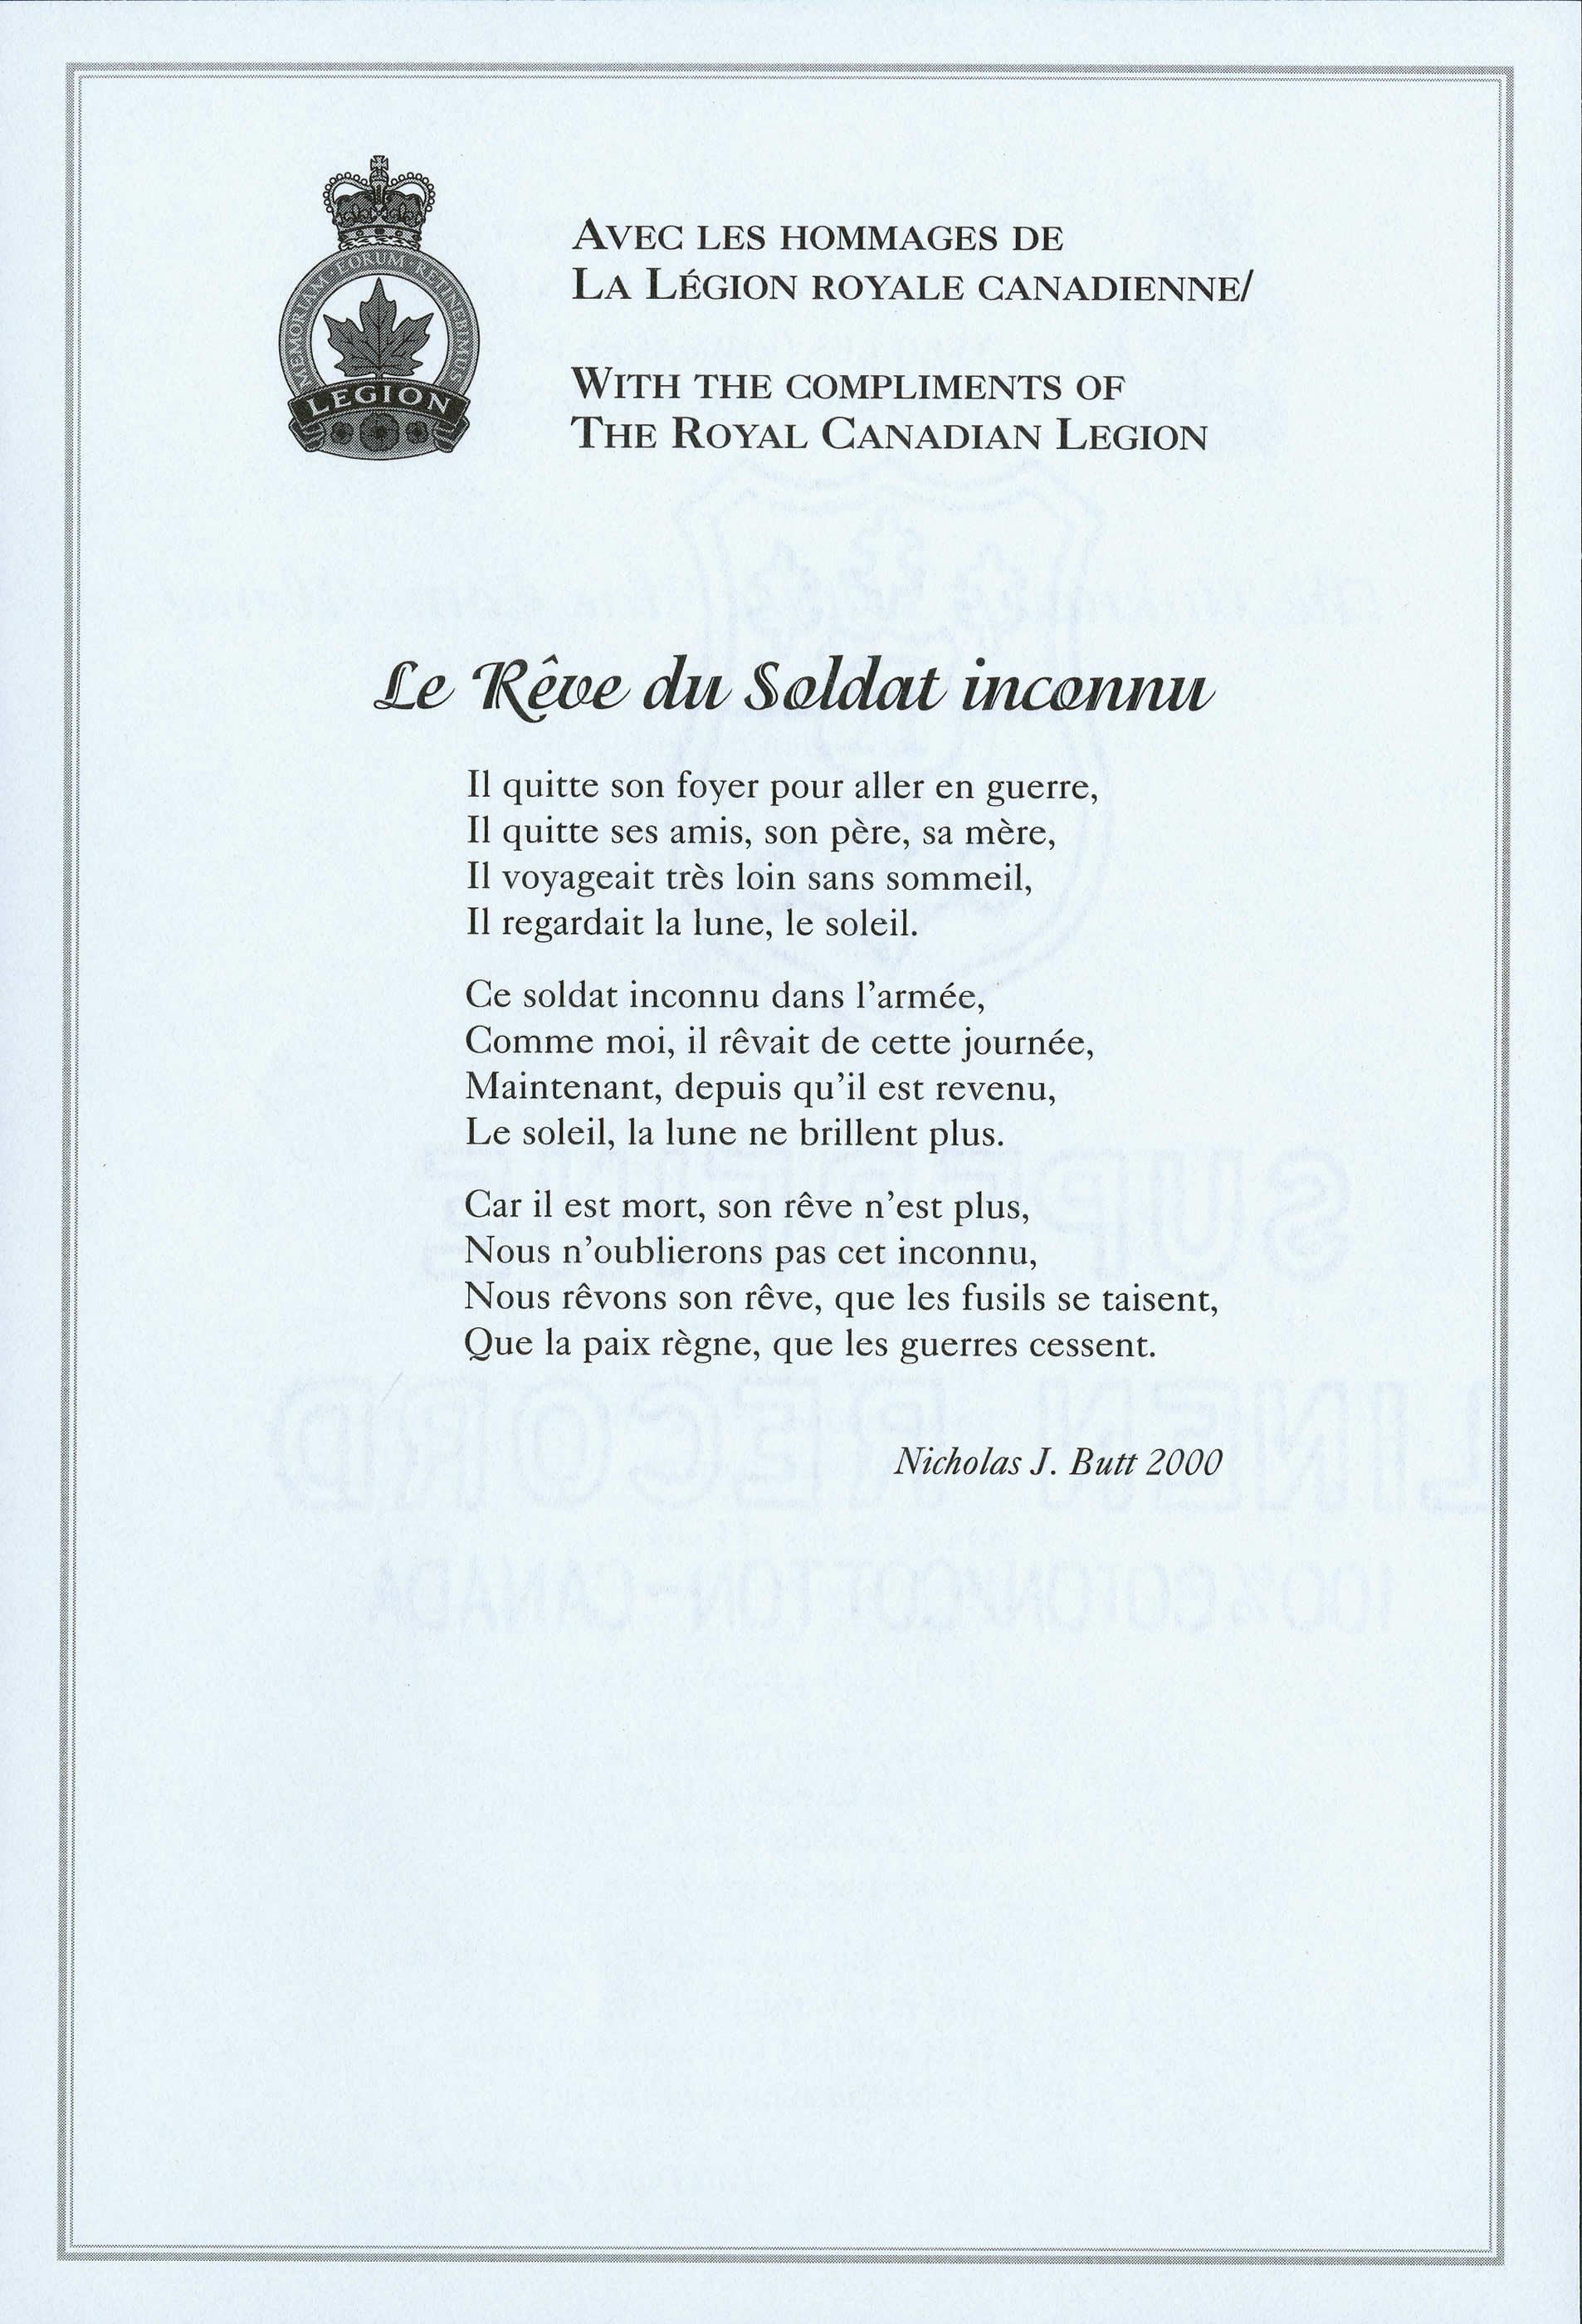 <i>Le Rêve du Soldat inconnu</i> (The Unknown Soldier's Dream)